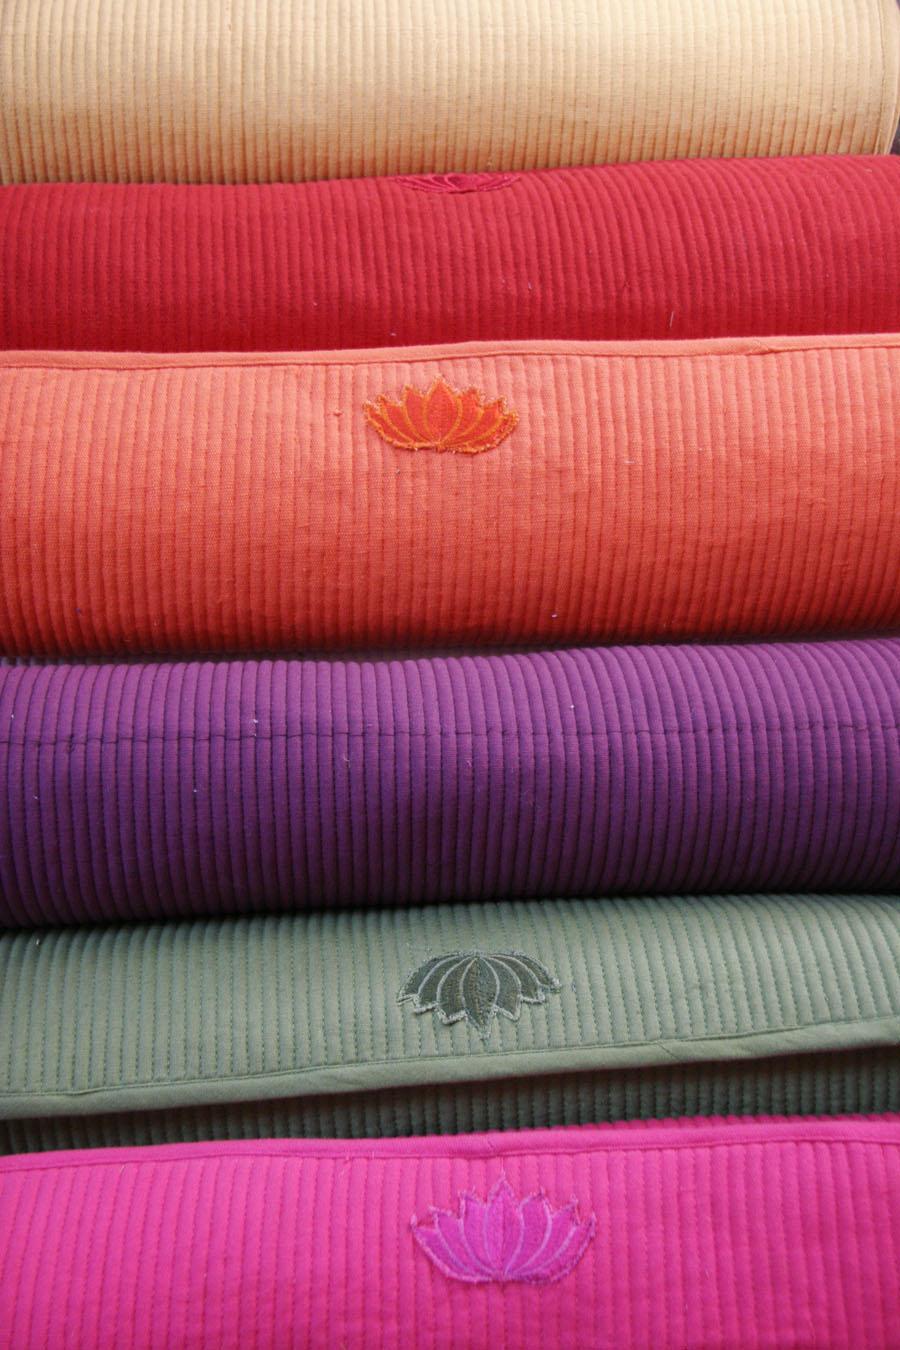 Shakti Yoga Mats - Handmade pure cotton mats!